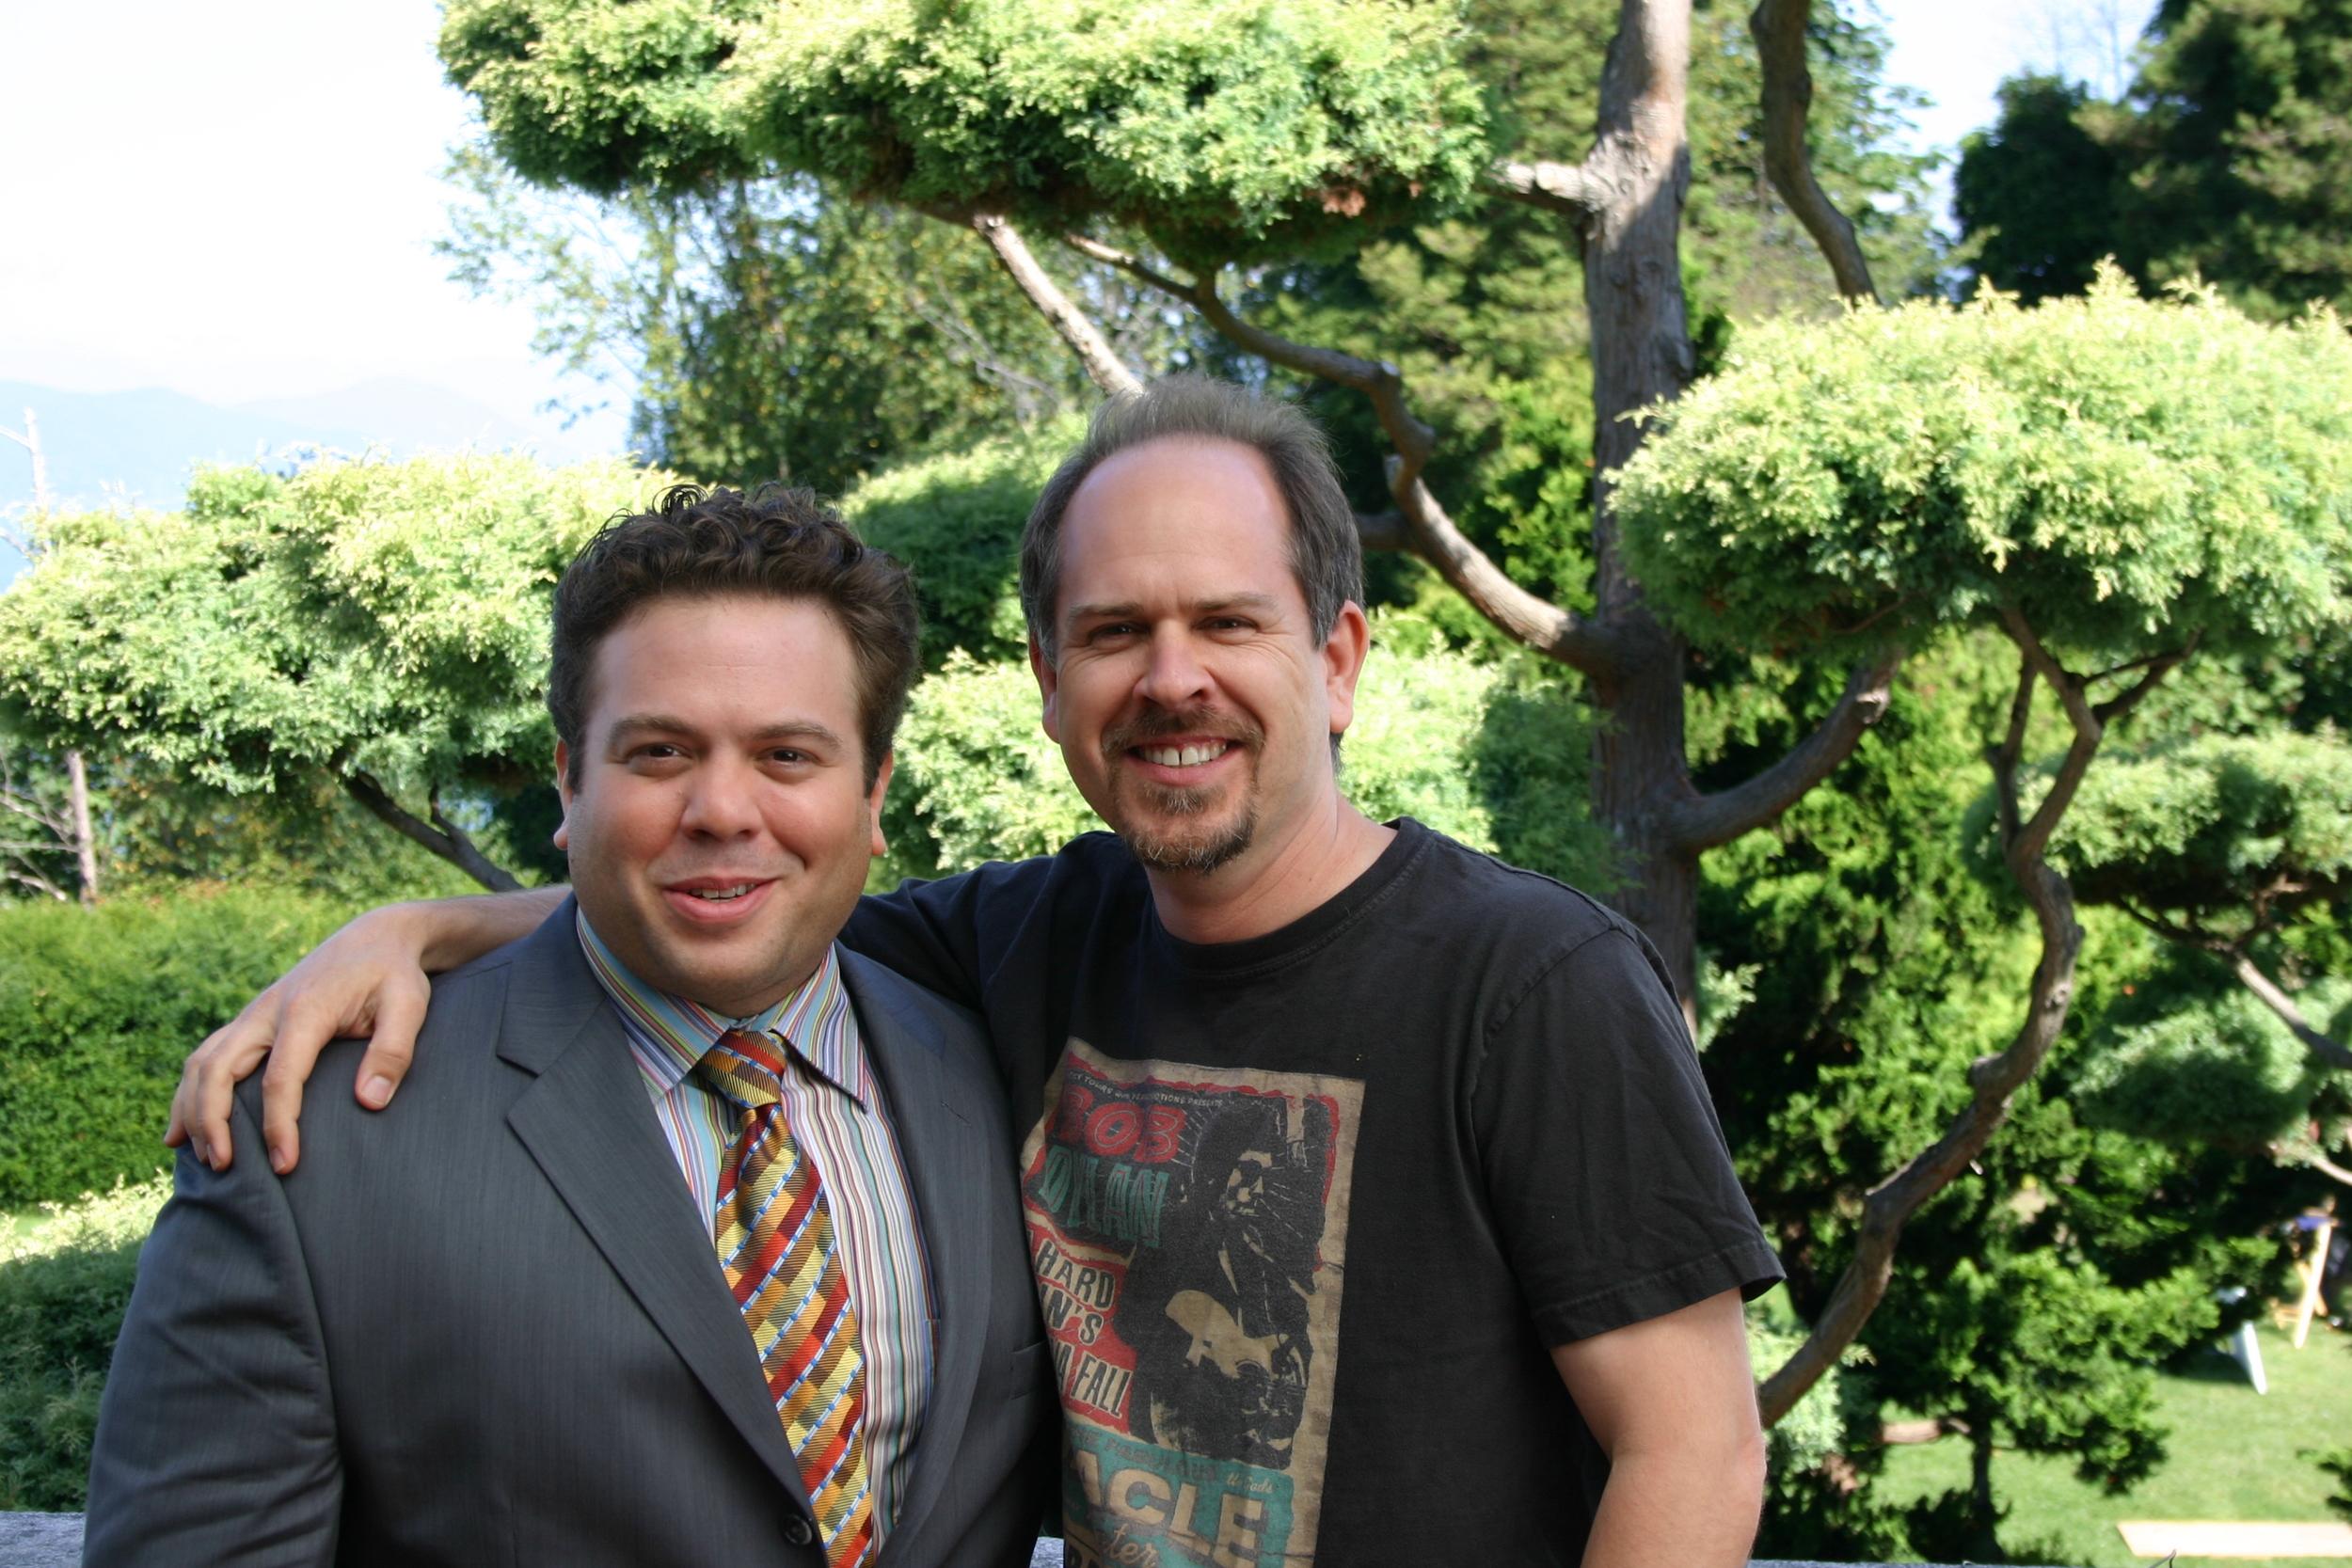 With Dan Fogler on Good Luck Chuck